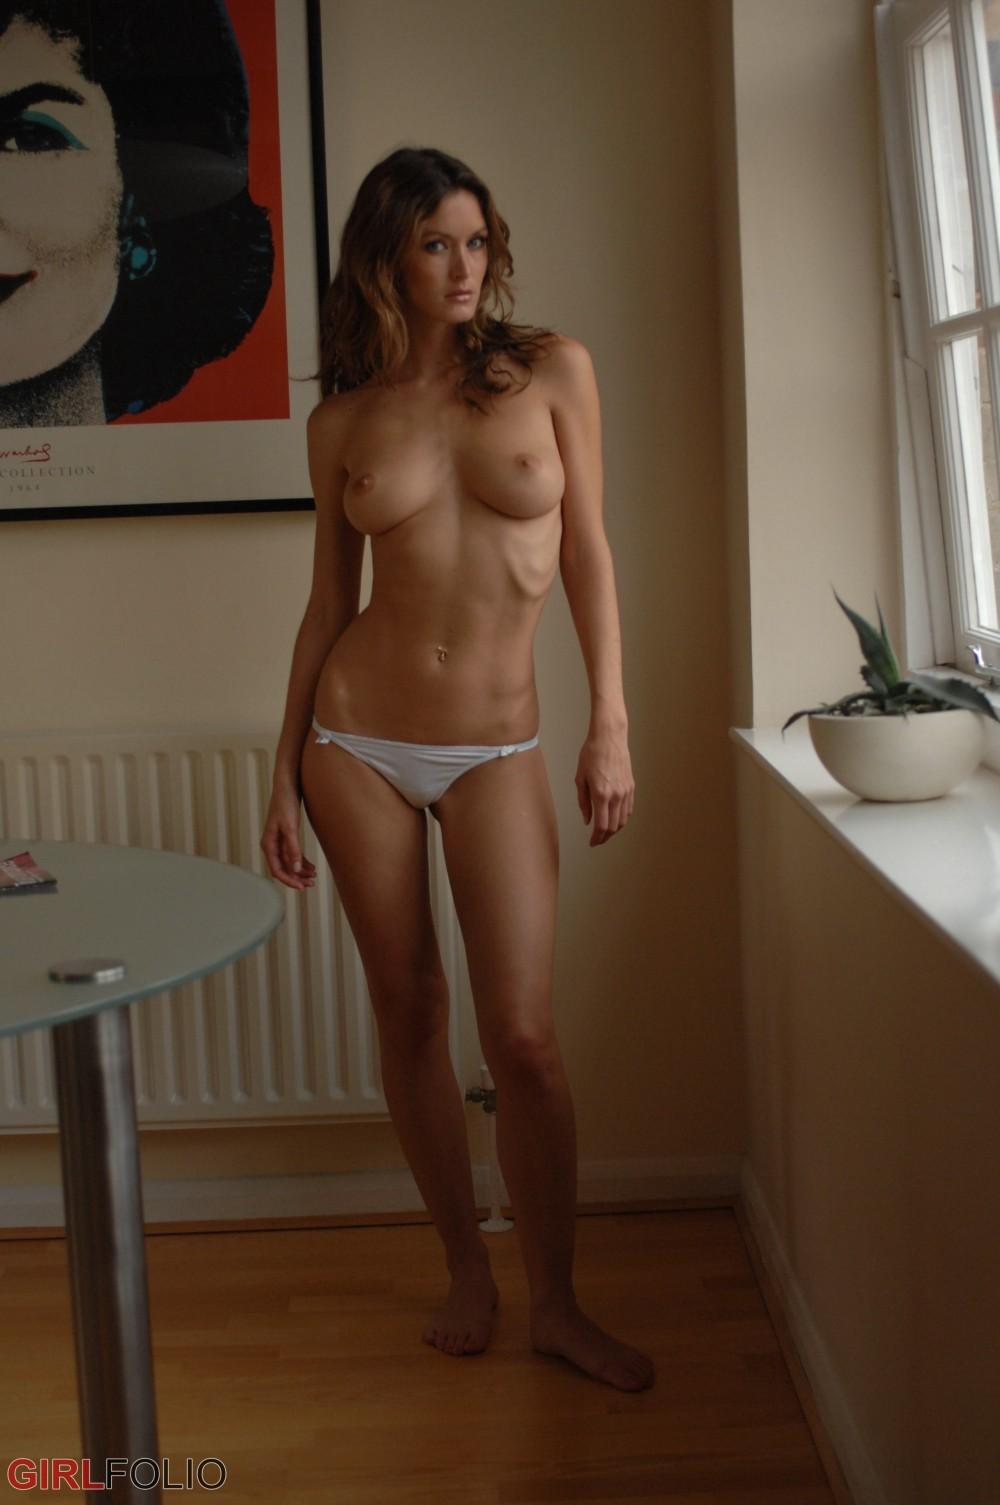 Nikkala stott xxx, suicide girls nude hairy pussy